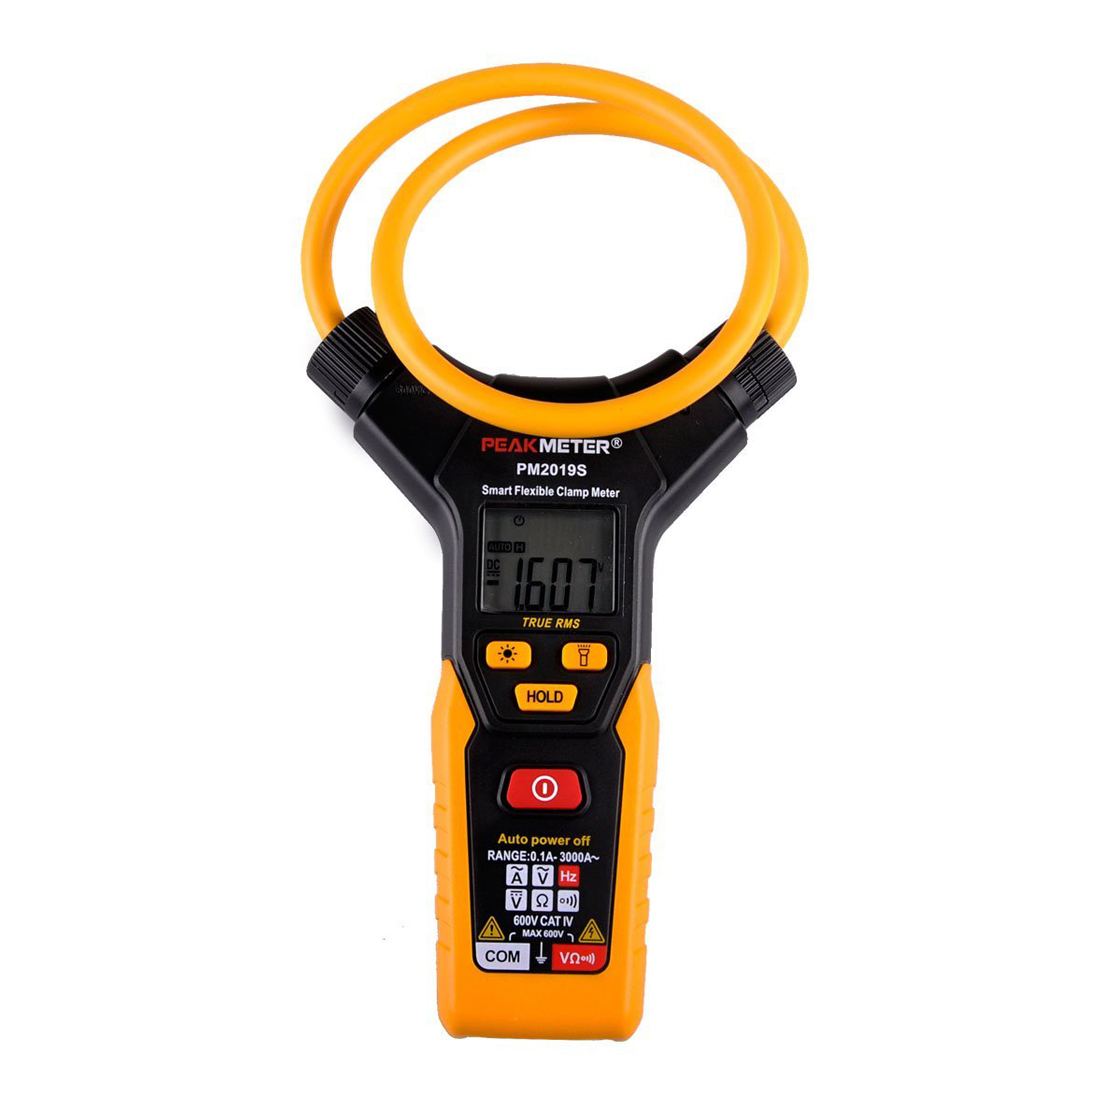 New Style PEAKMETER PM2019S Digital Flexible Clamp Meter Smart AC DC Multimeter Voltage Tester svodka ot strelkova 19 06 2014 2019 s pometkoj srochno